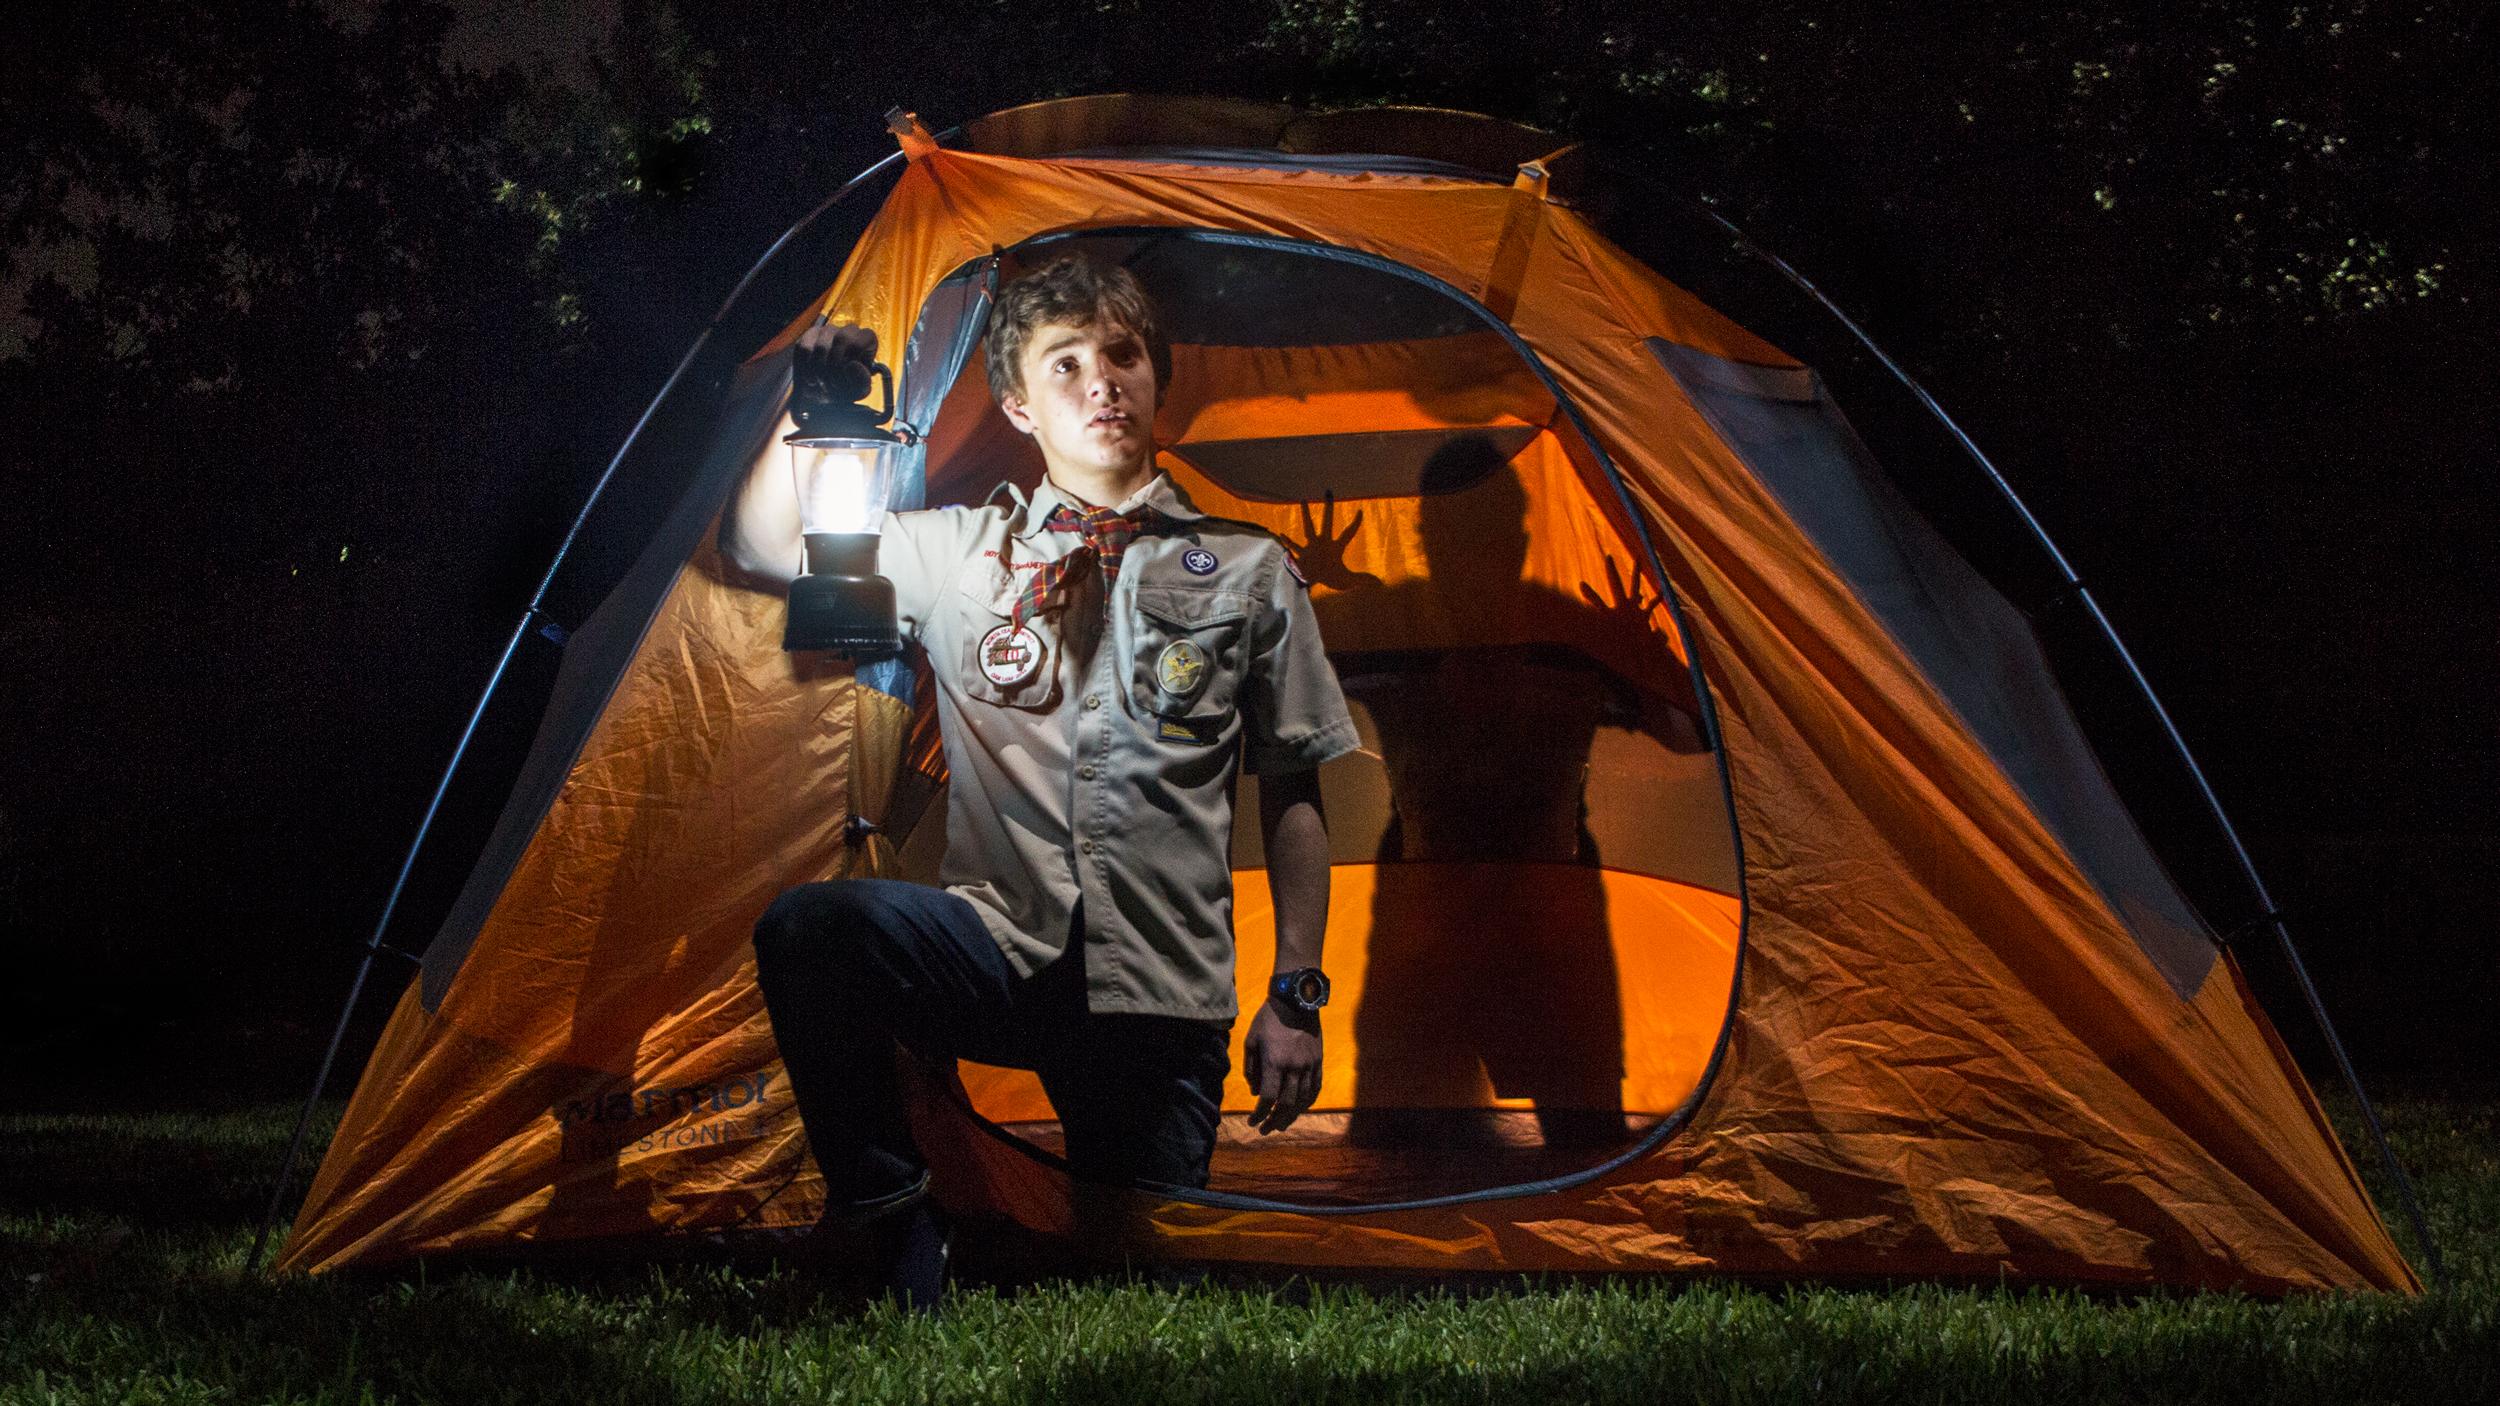 scary-tent.jpg